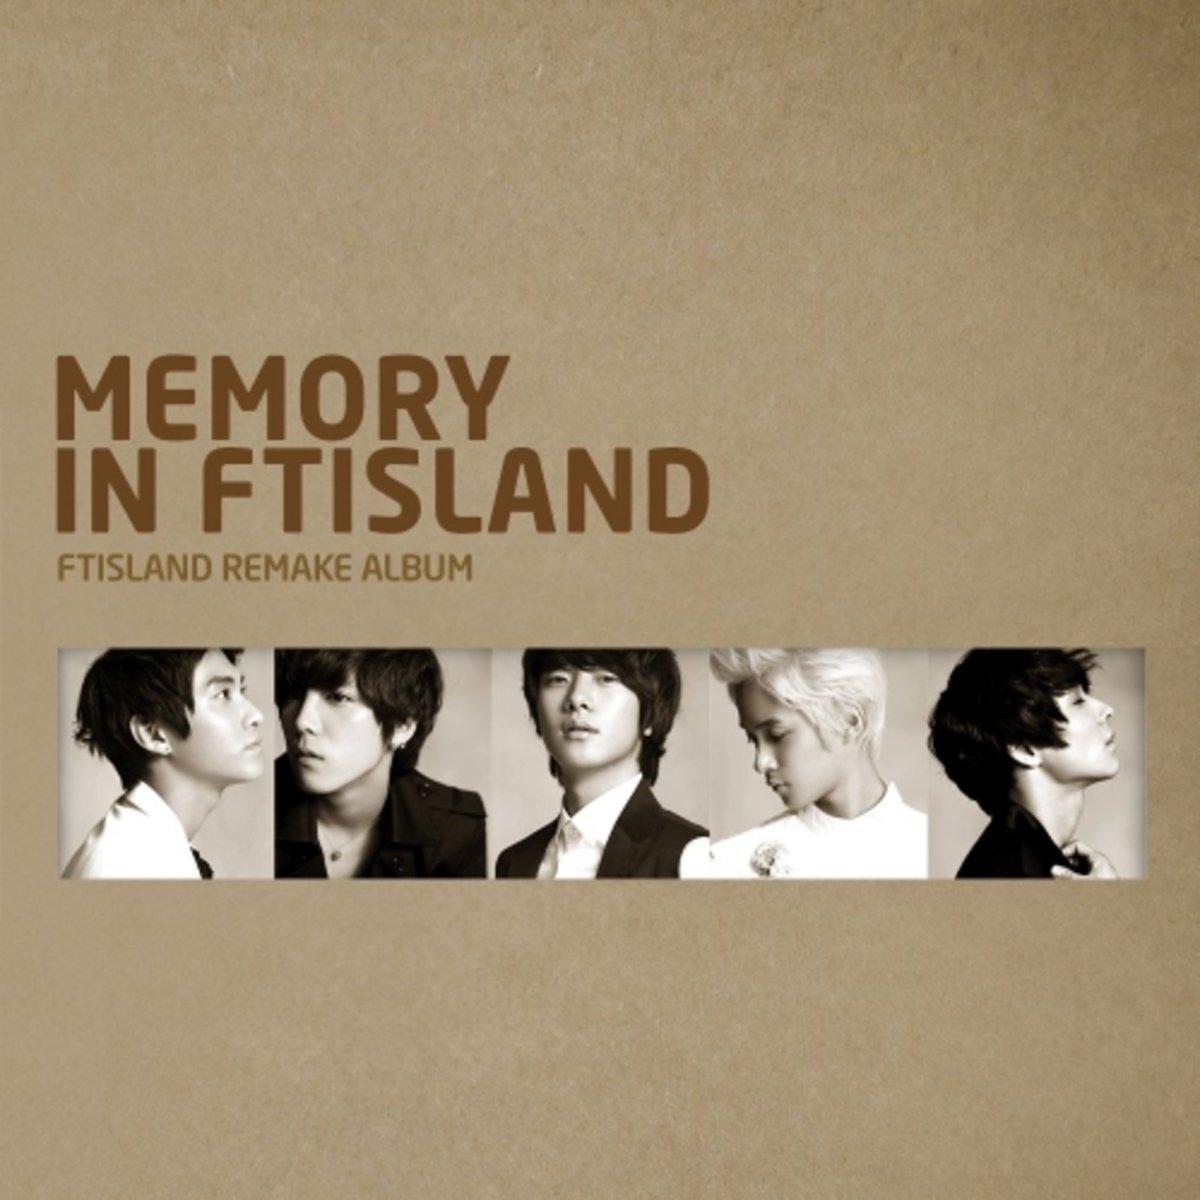 FTISLAND - Remake Album [Memory In FtIsland]_34294